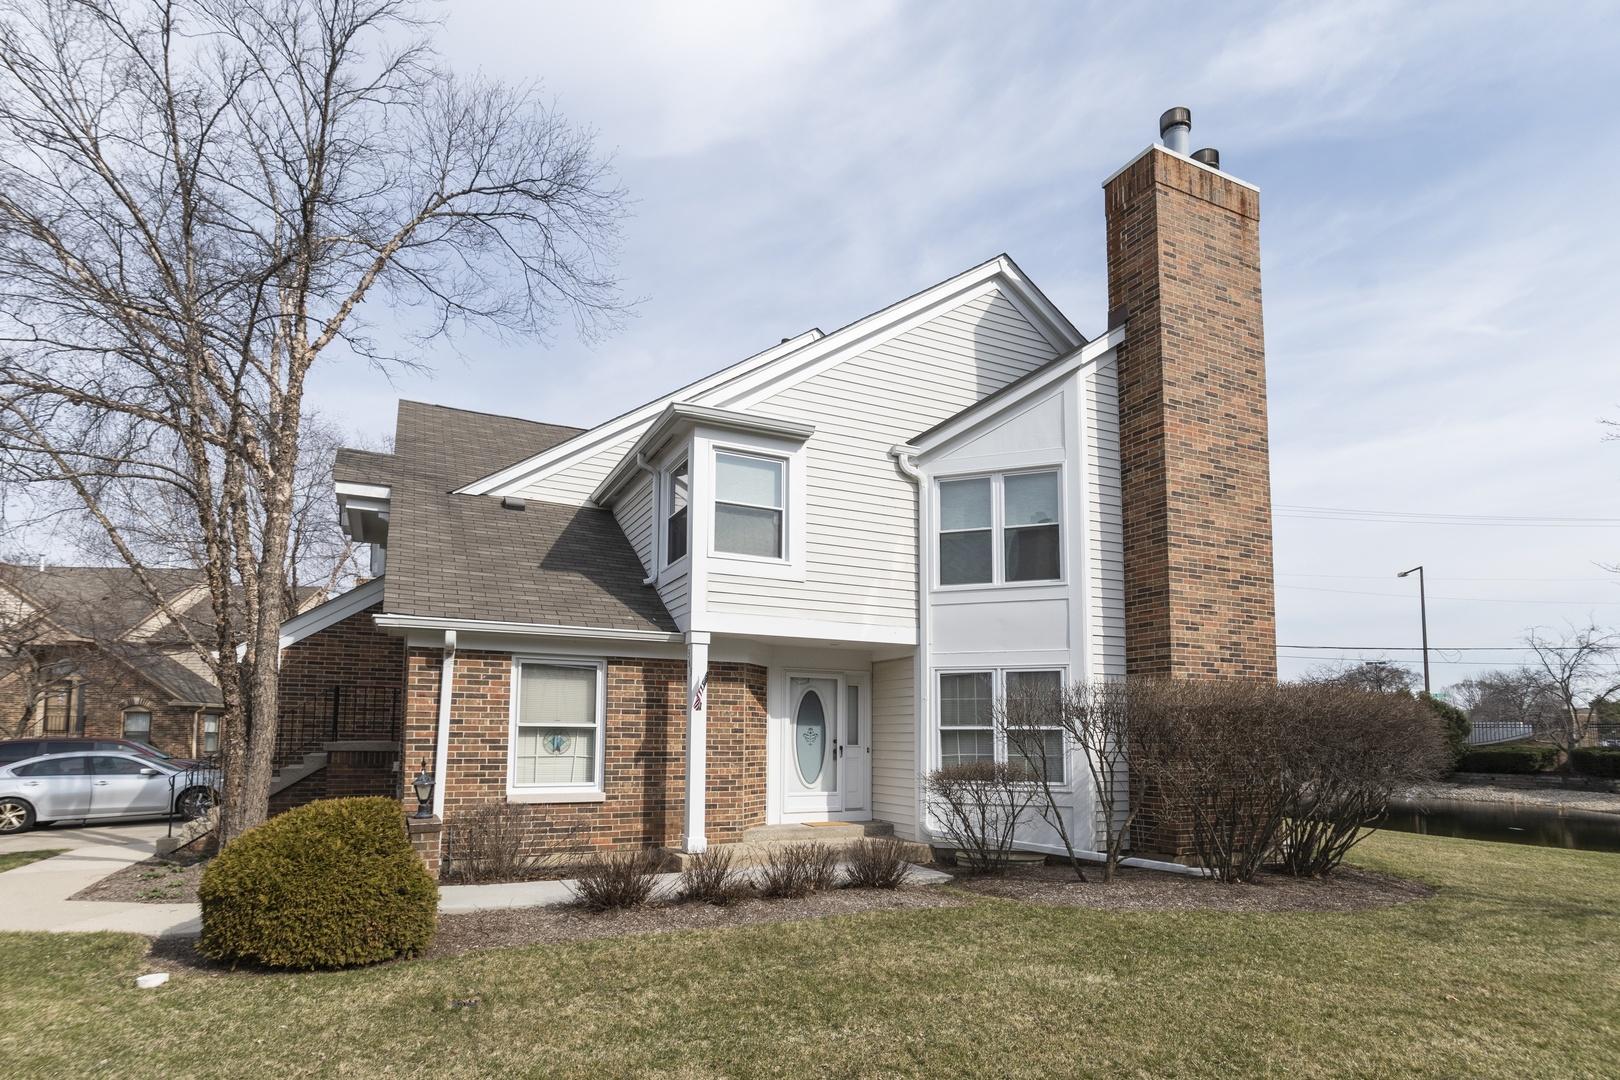 363 Willow ,Buffalo Grove, Illinois 60089